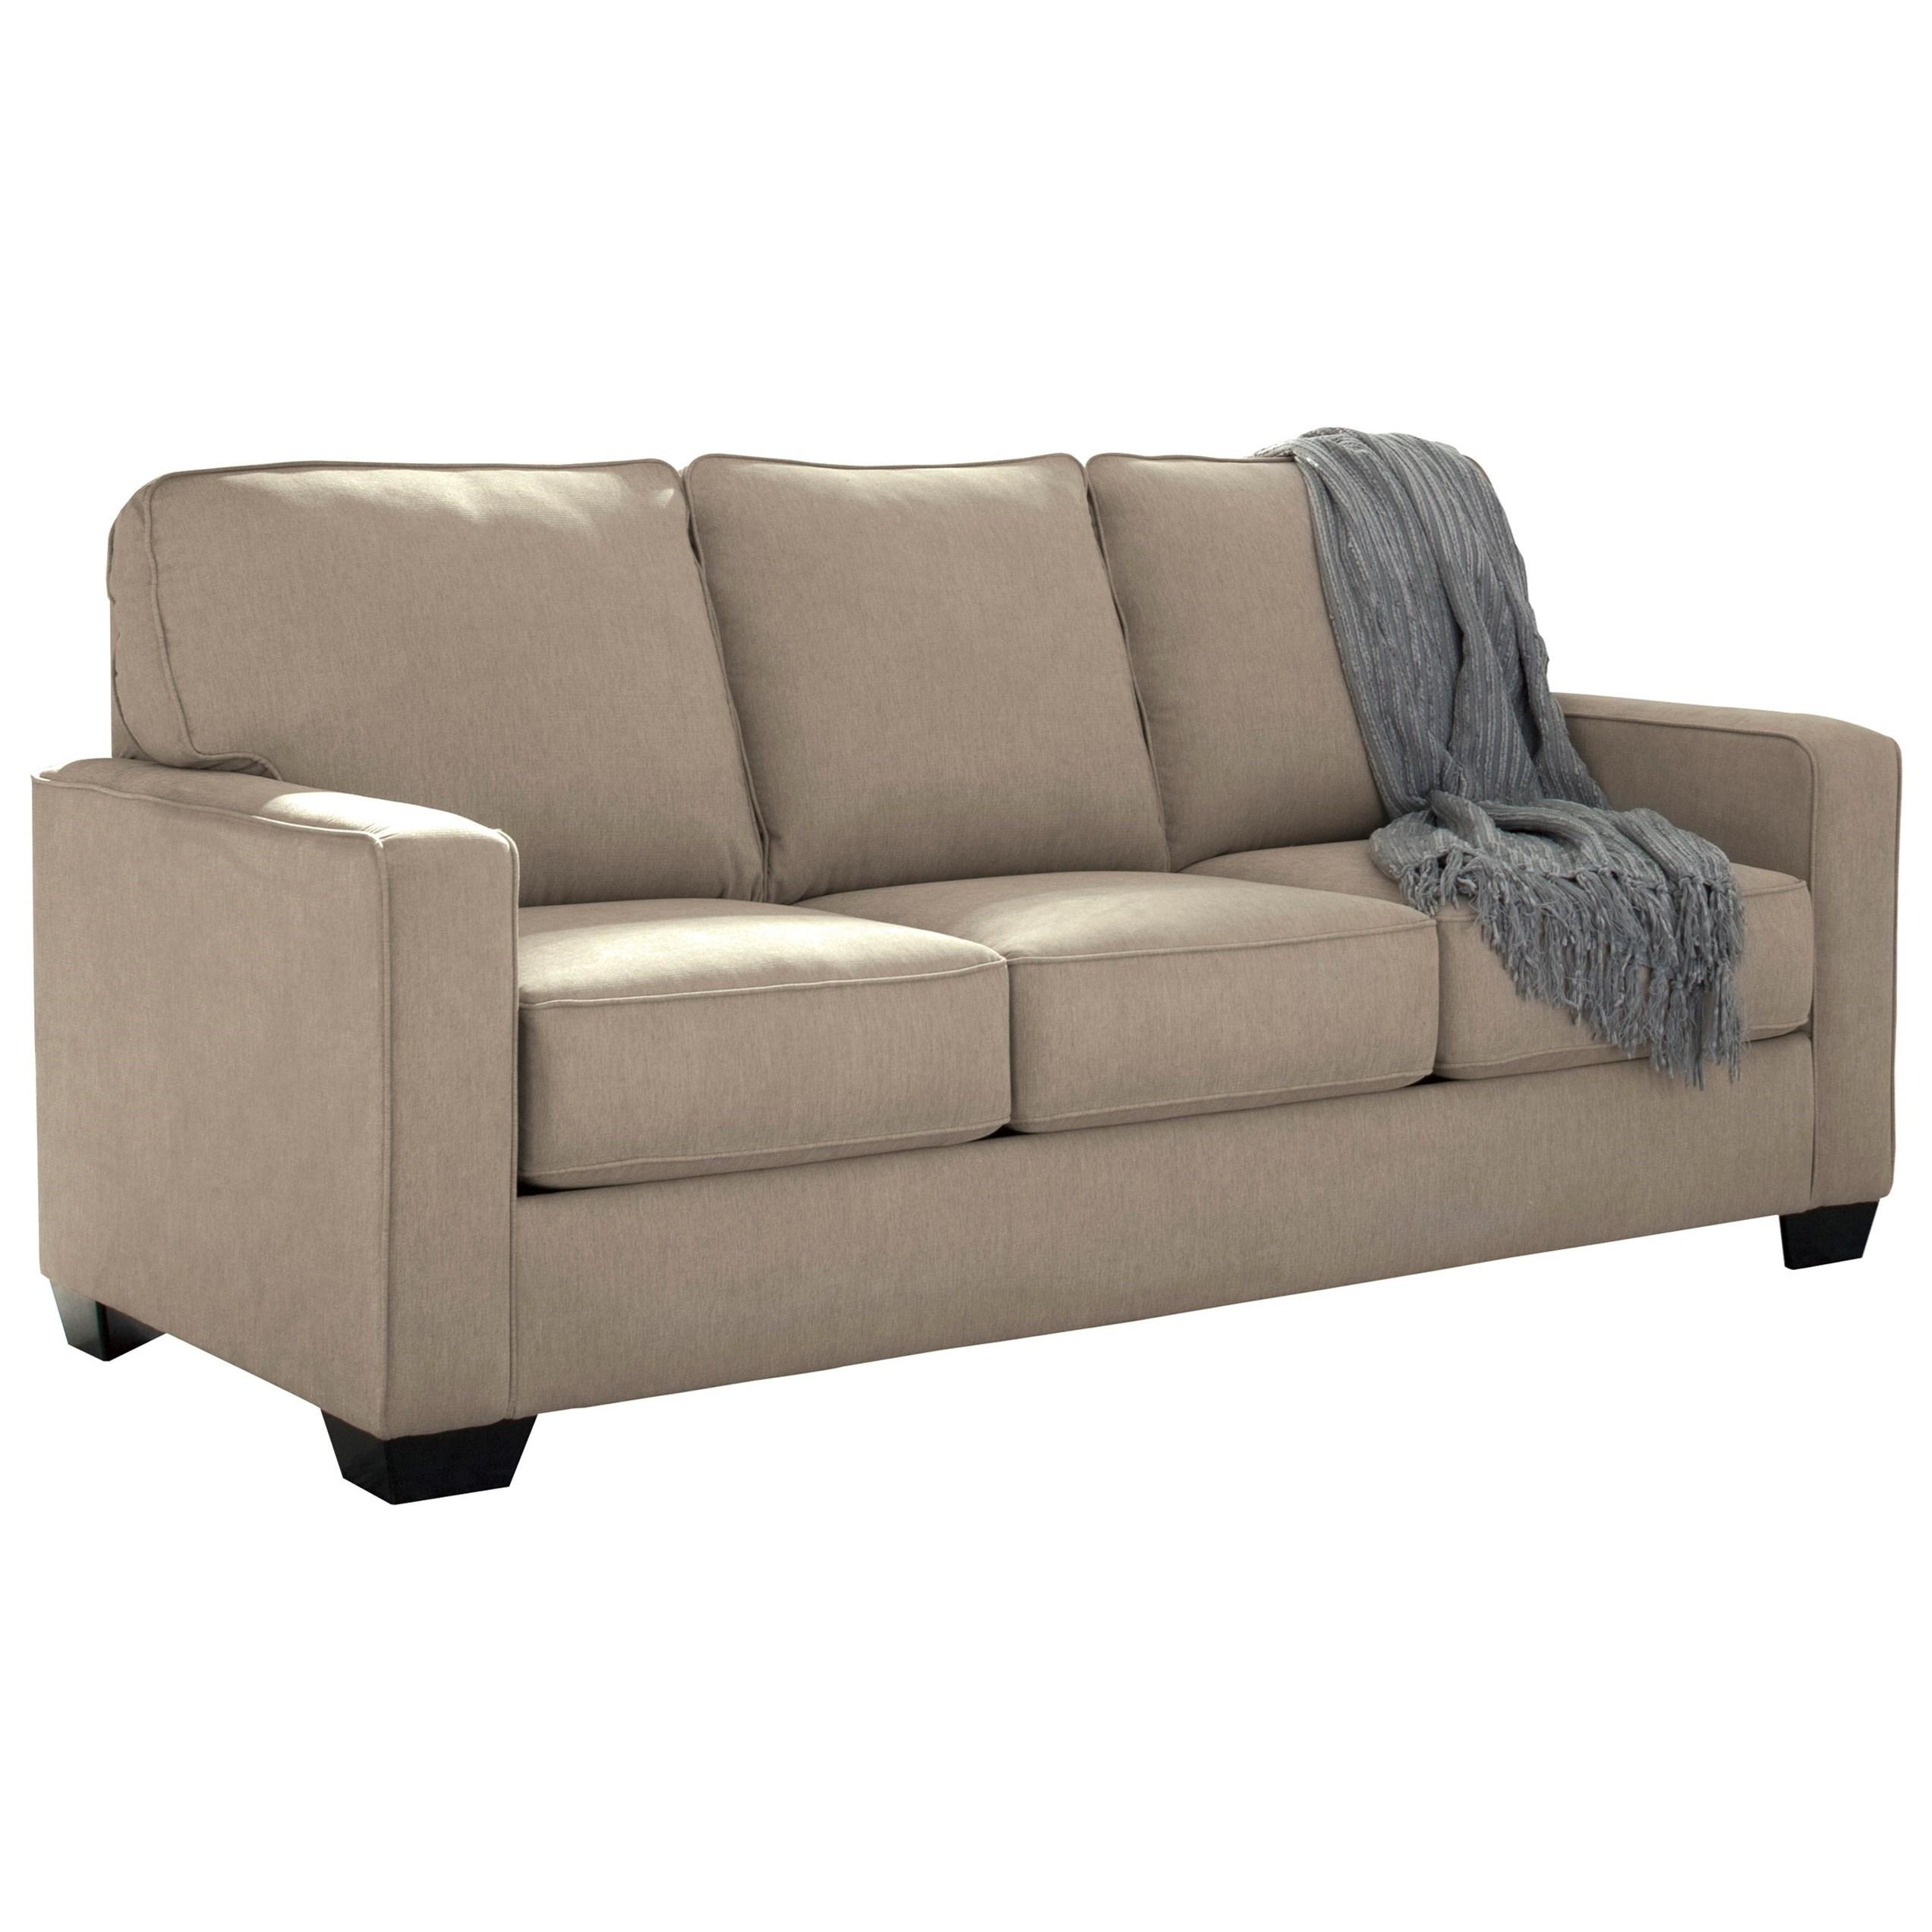 foam sofa sleeper amanda modern faux leather large sectional signature design by ashley zeb 3590236 full with memory mattress